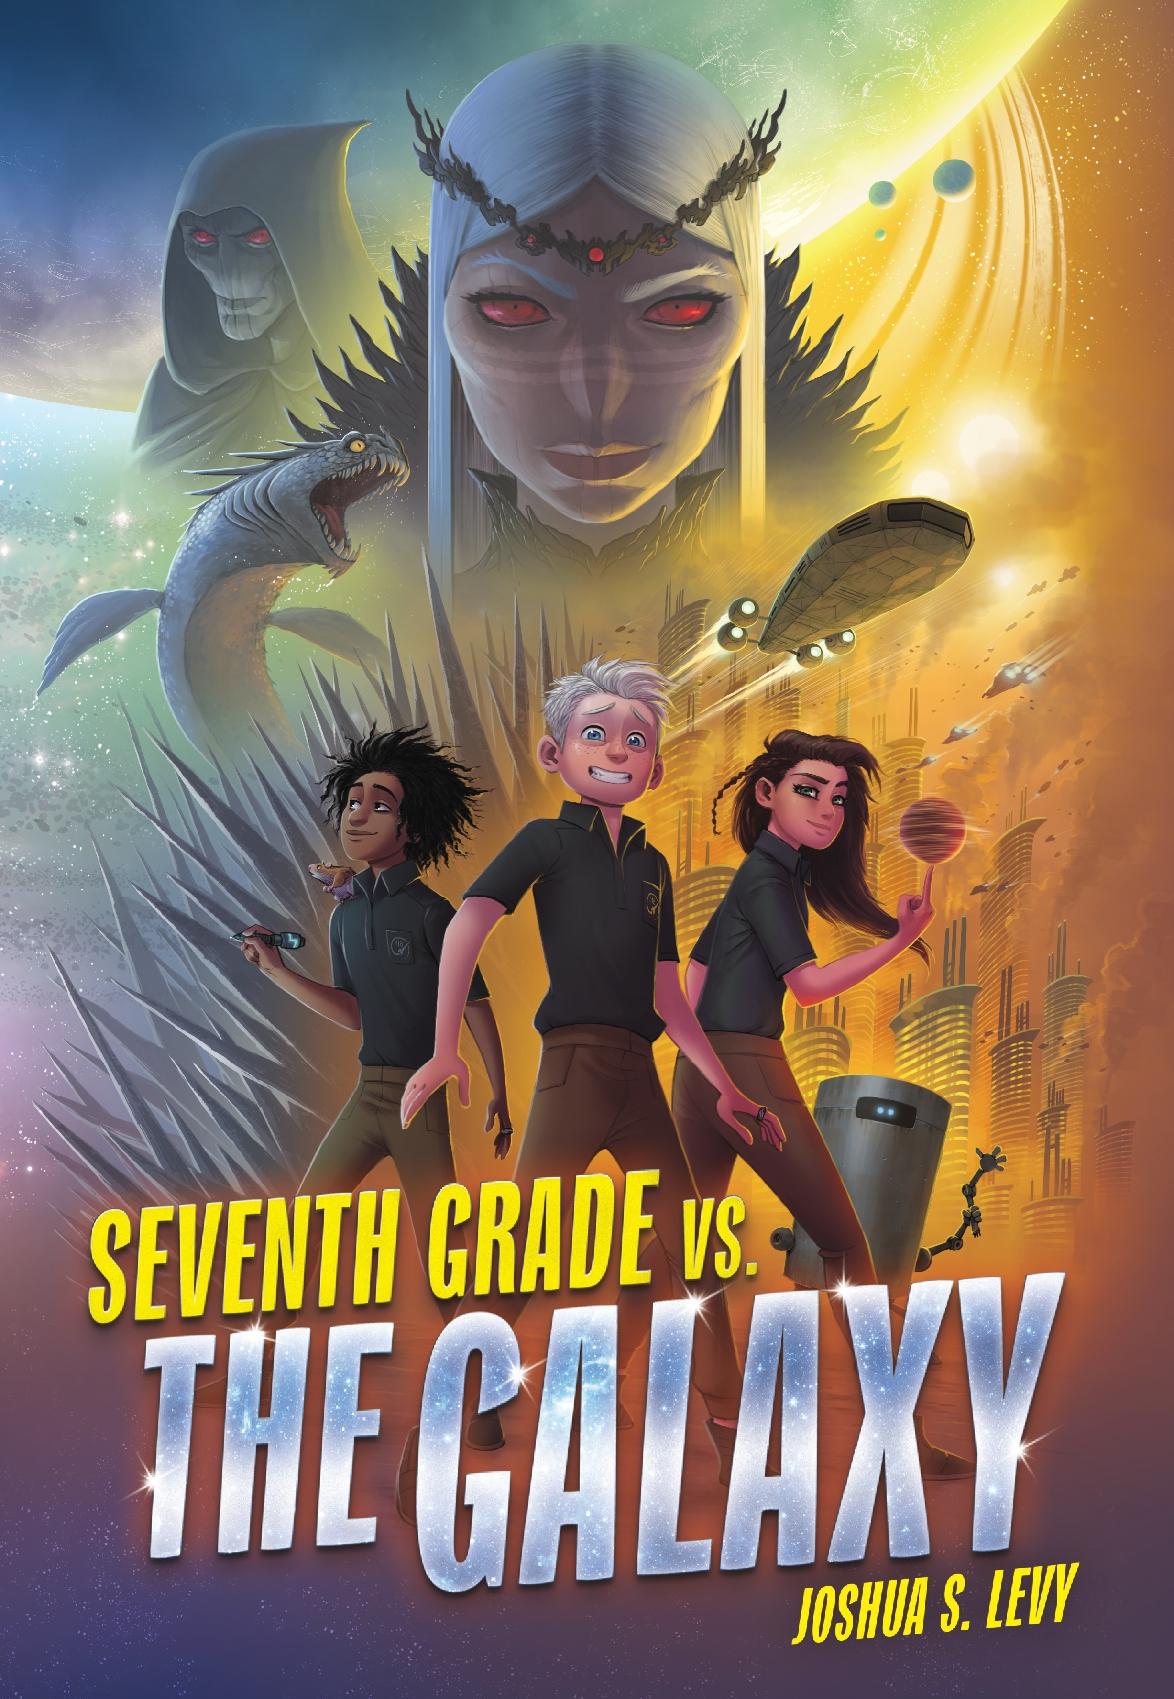 SeventhGrade_vsGalaxy [Cover Image]-1.jpg